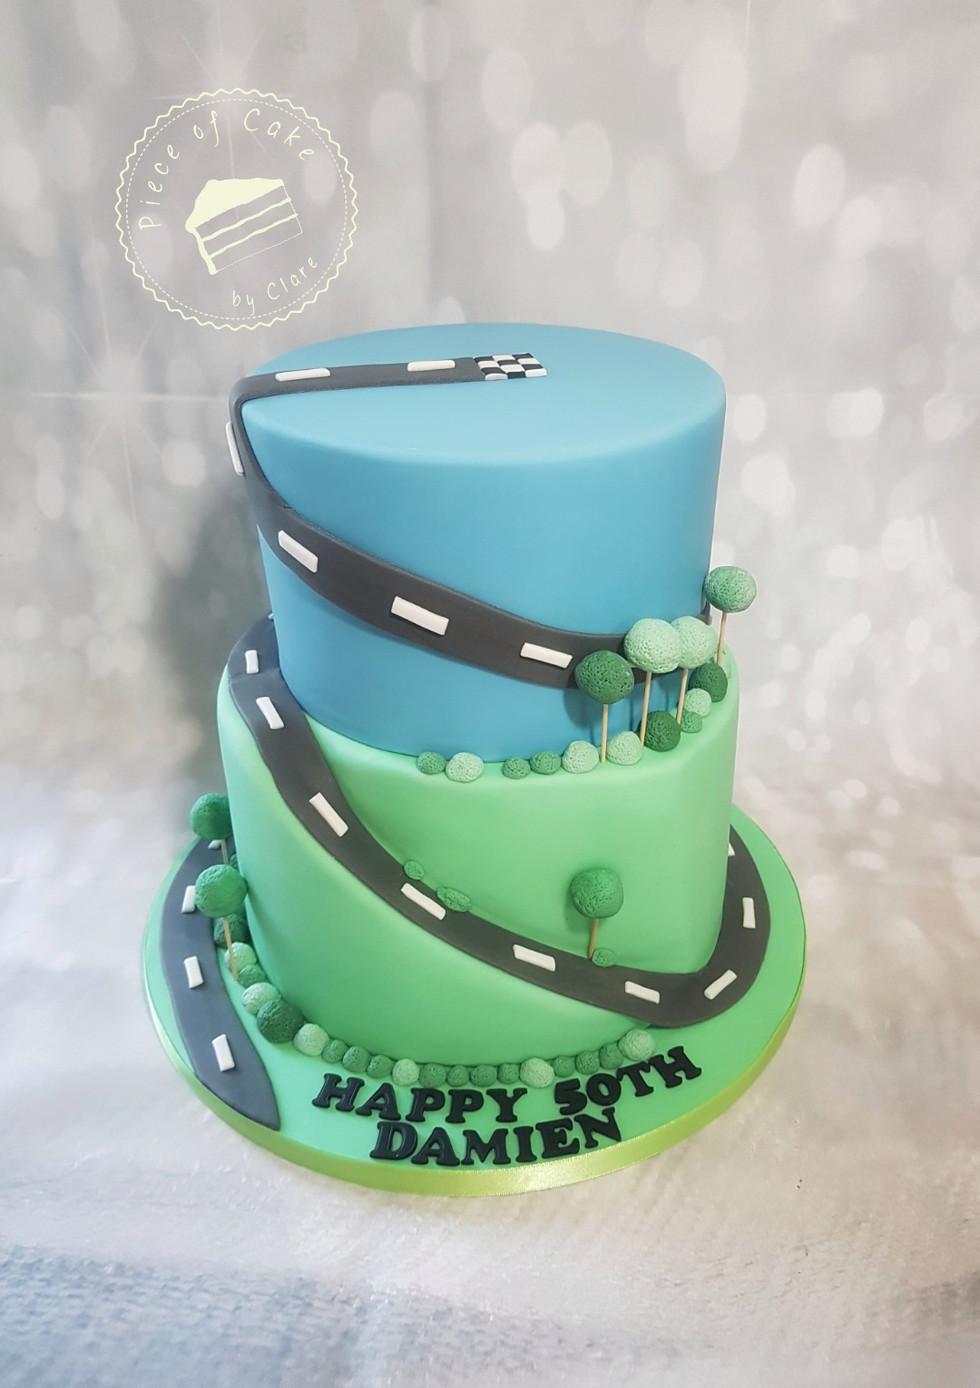 Birthday cake for a cyclist